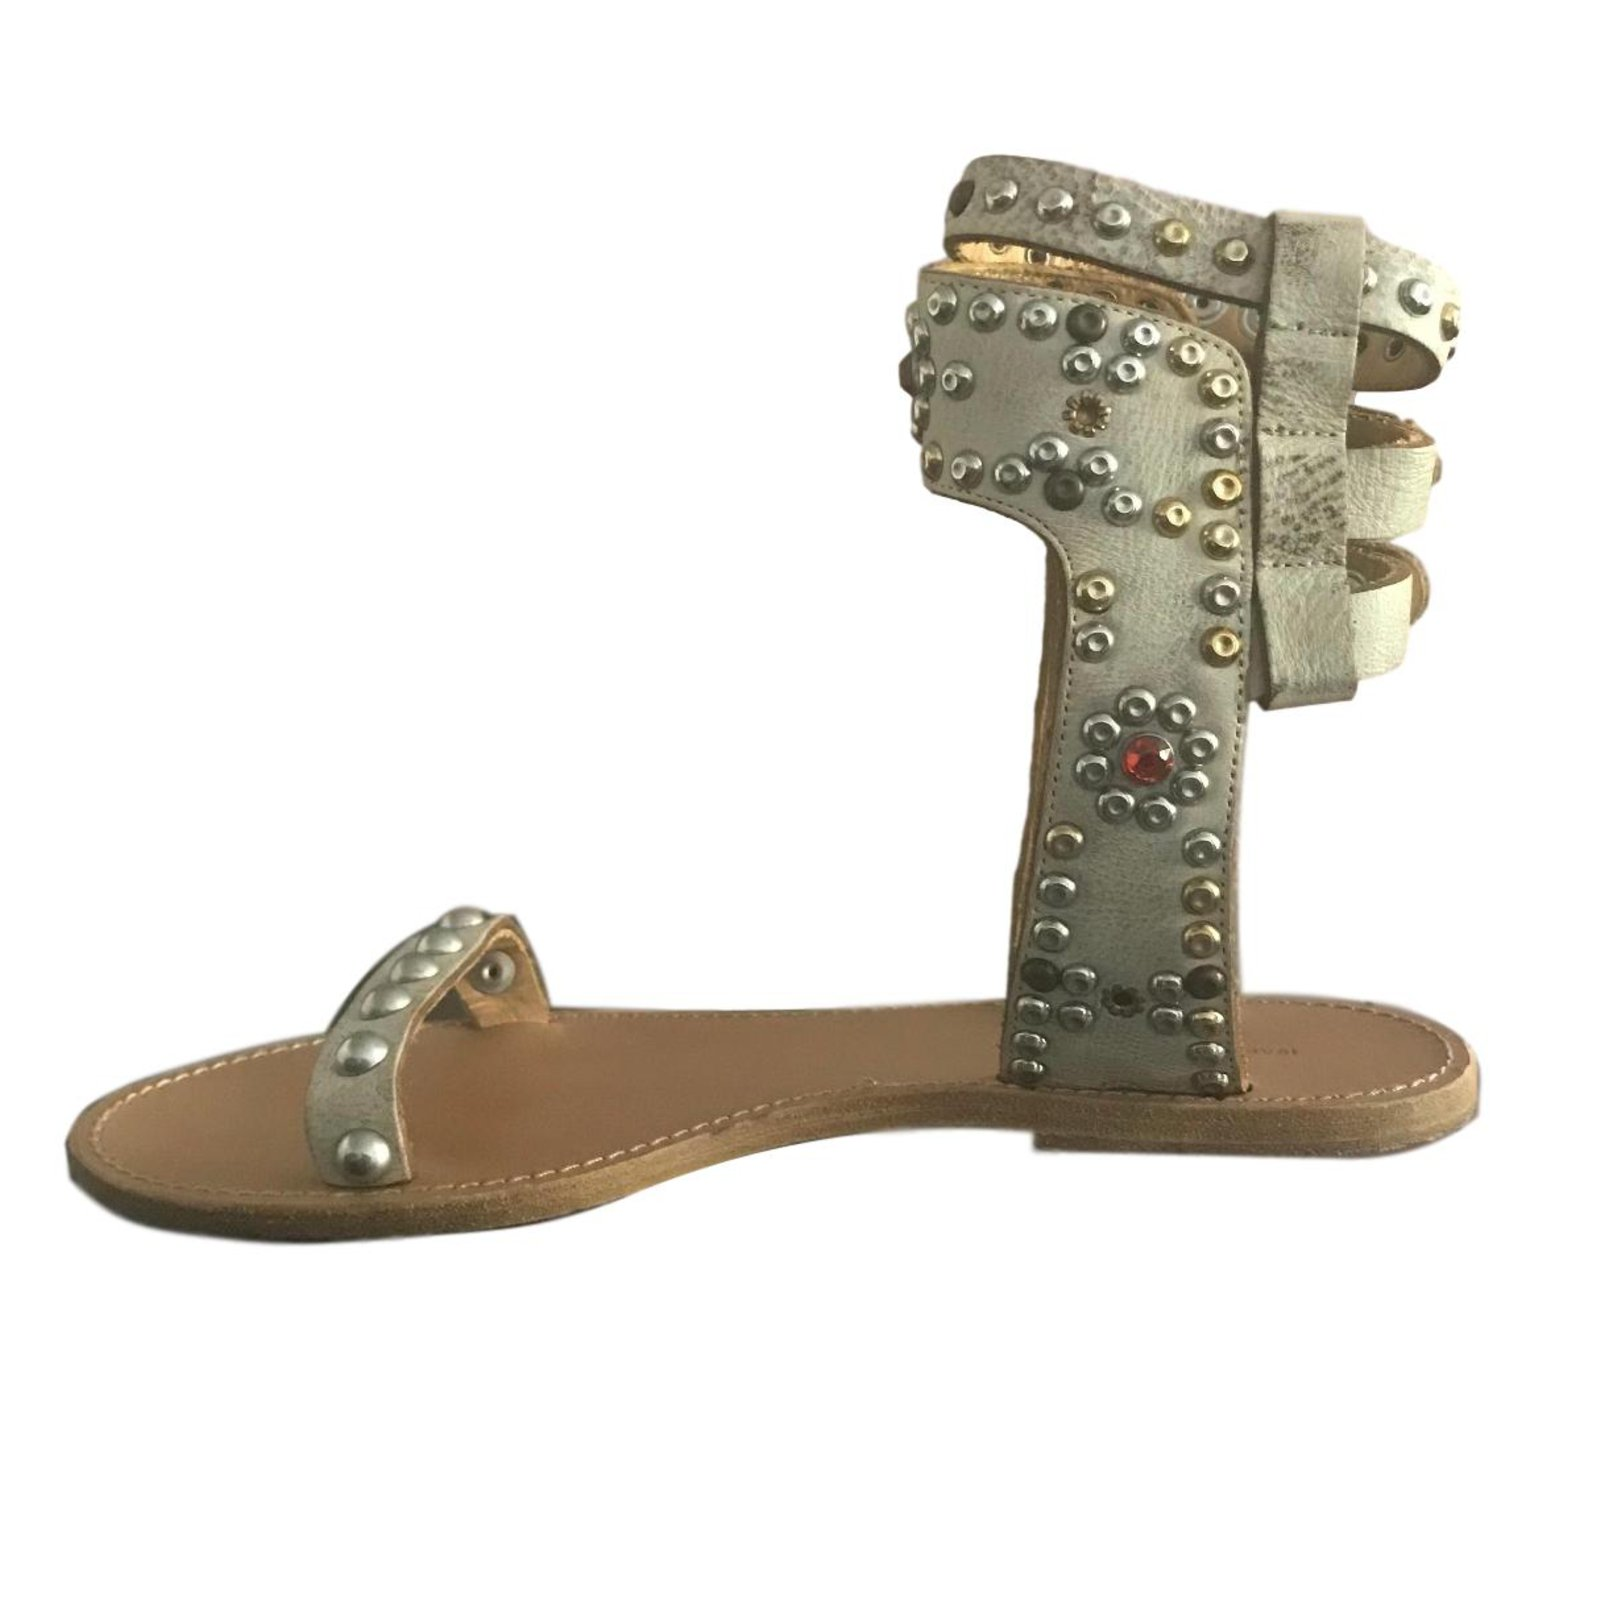 6448110ba061 Isabel marant sandals leather multiple colors ref jpg 1600x1600 Isabel  marant sandals